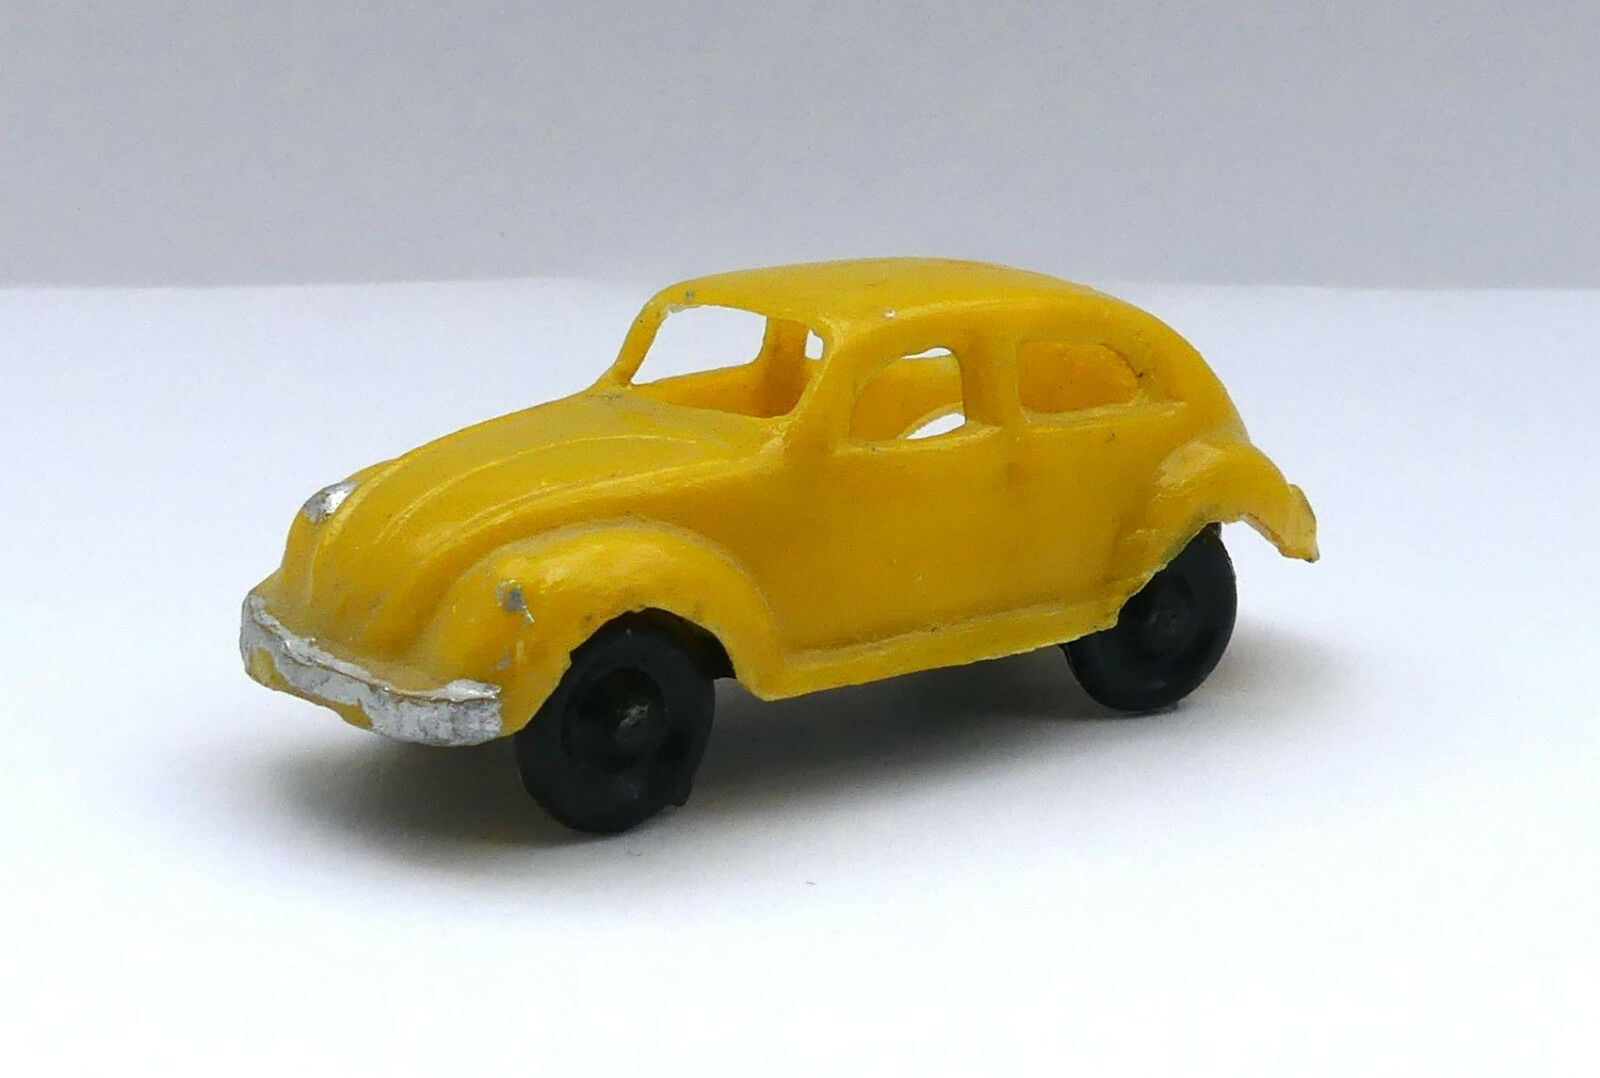 Plastikauto,Drahtachser,unverglast,VW Brezelkäfer,ovali,1 87,HO, aus Mexico